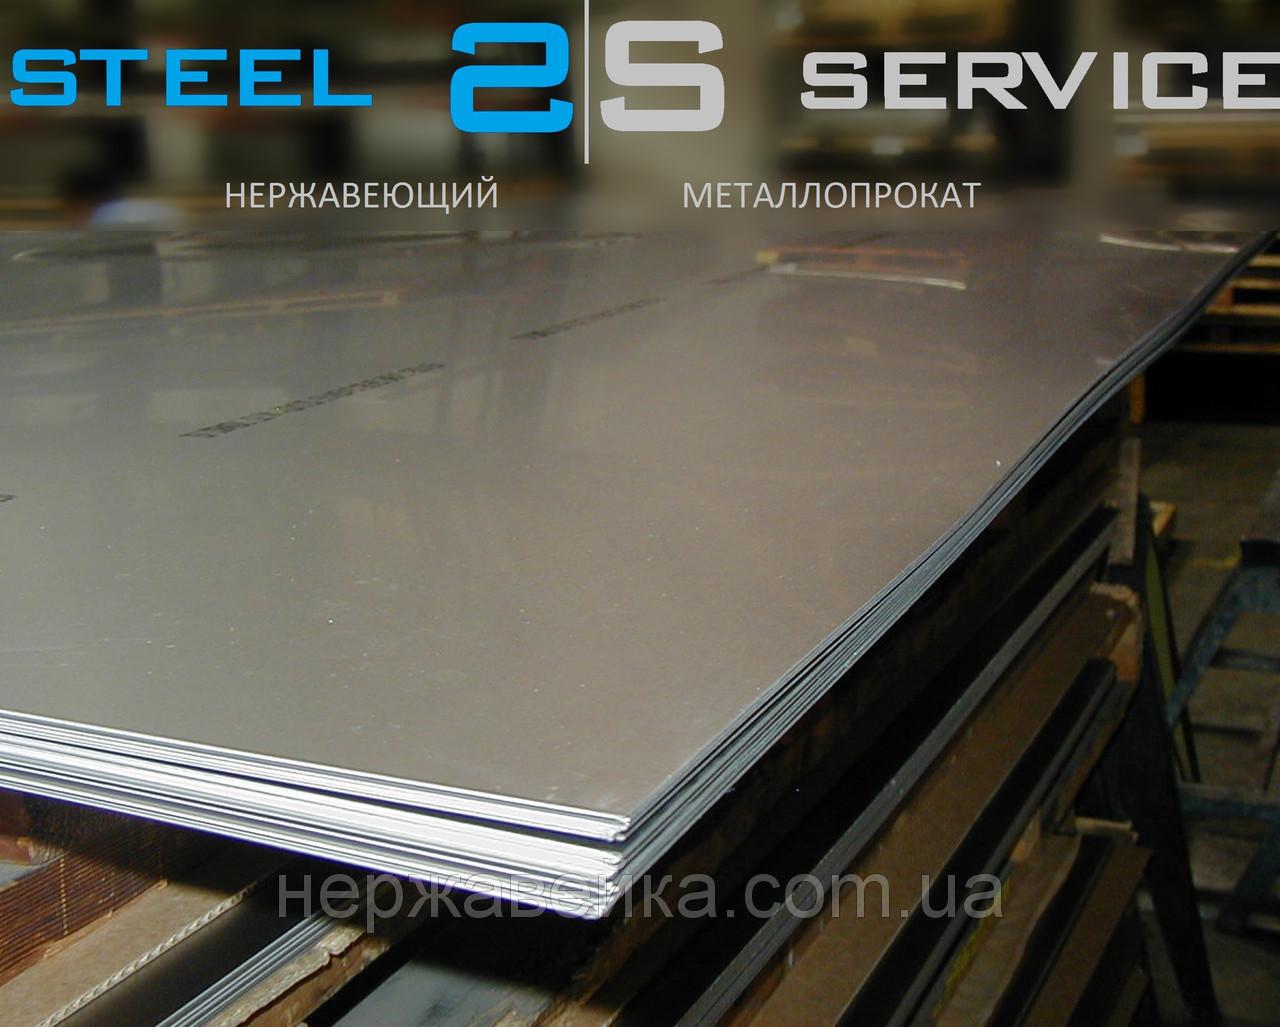 Листовая нержавейка 12х1250х2500мм  AISI 321(08Х18Н10Т) F1 - горячекатанный,  пищевой